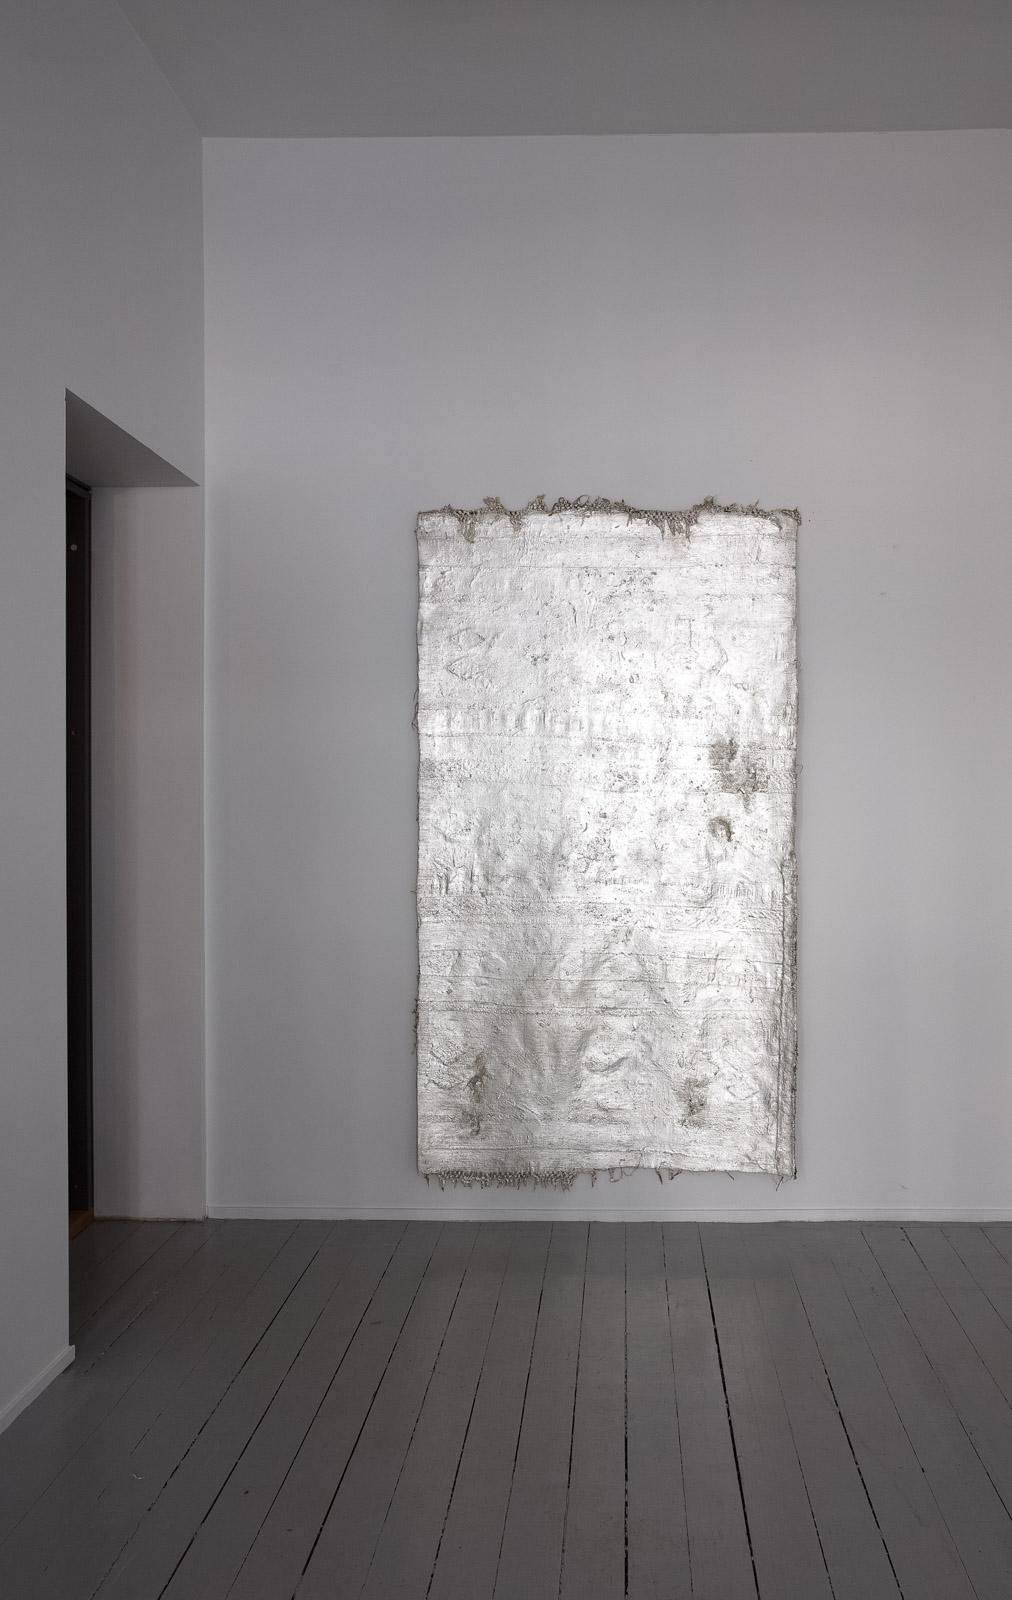 Martin Erik Andersen, Al-mulk, 2017, Anatolian rug, rubber, silverleaf, lacquer, 220 x 119 cm